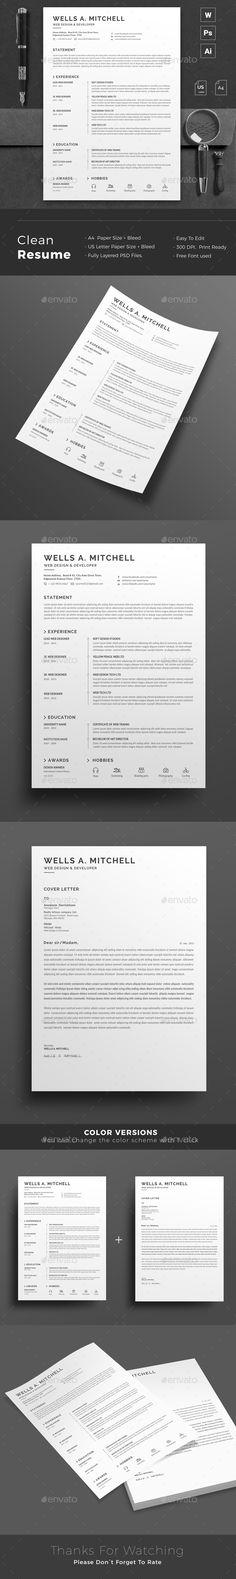 28 best Resume Templates images on Pinterest Cv template, Resume